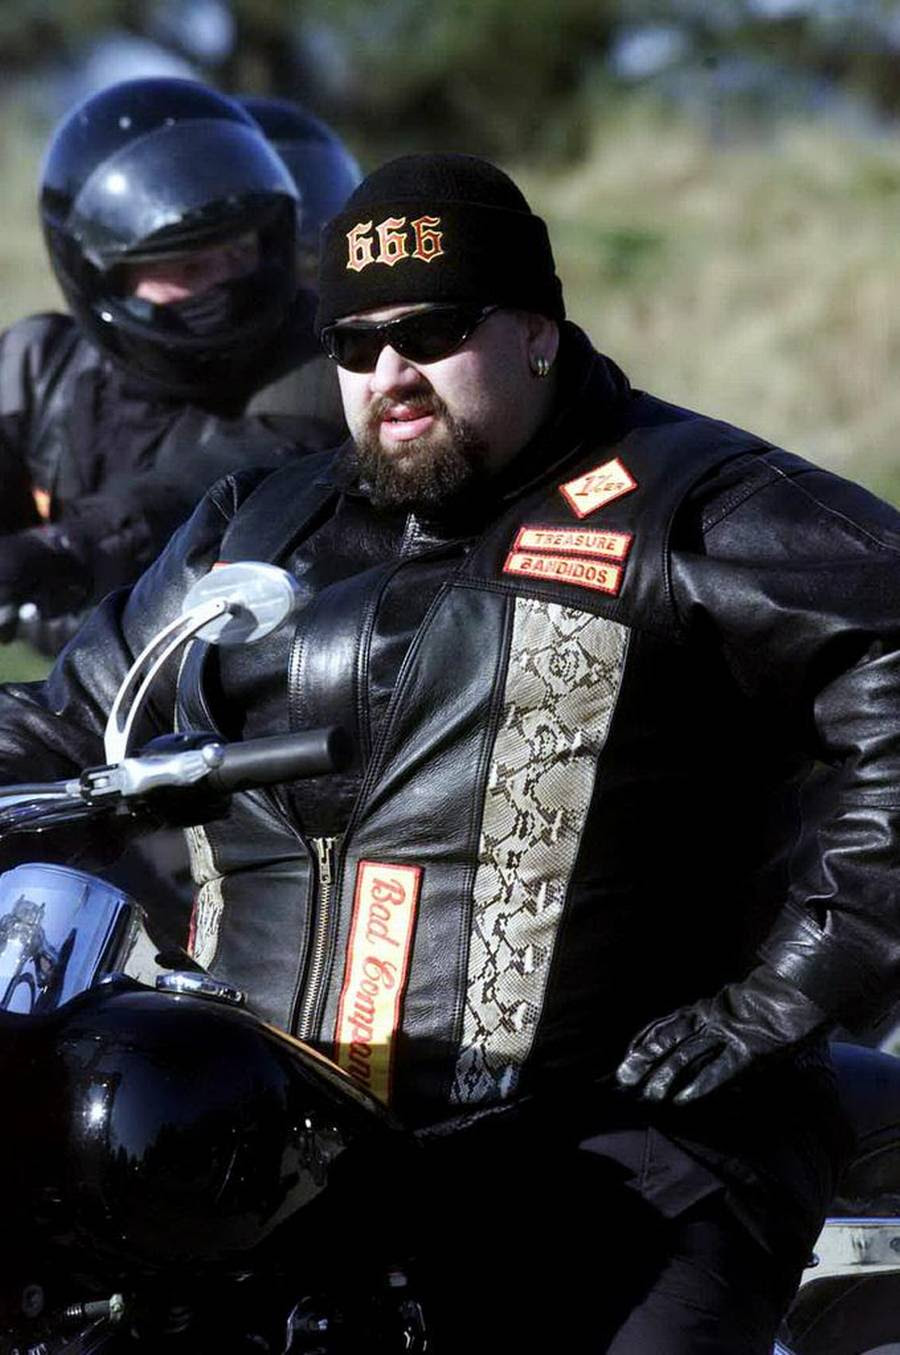 Bandidos-rockeren Poul 'Big Mac' Joachim Hansen skal efter planen begraves næste weekend. (Foto: Søren Jensen)